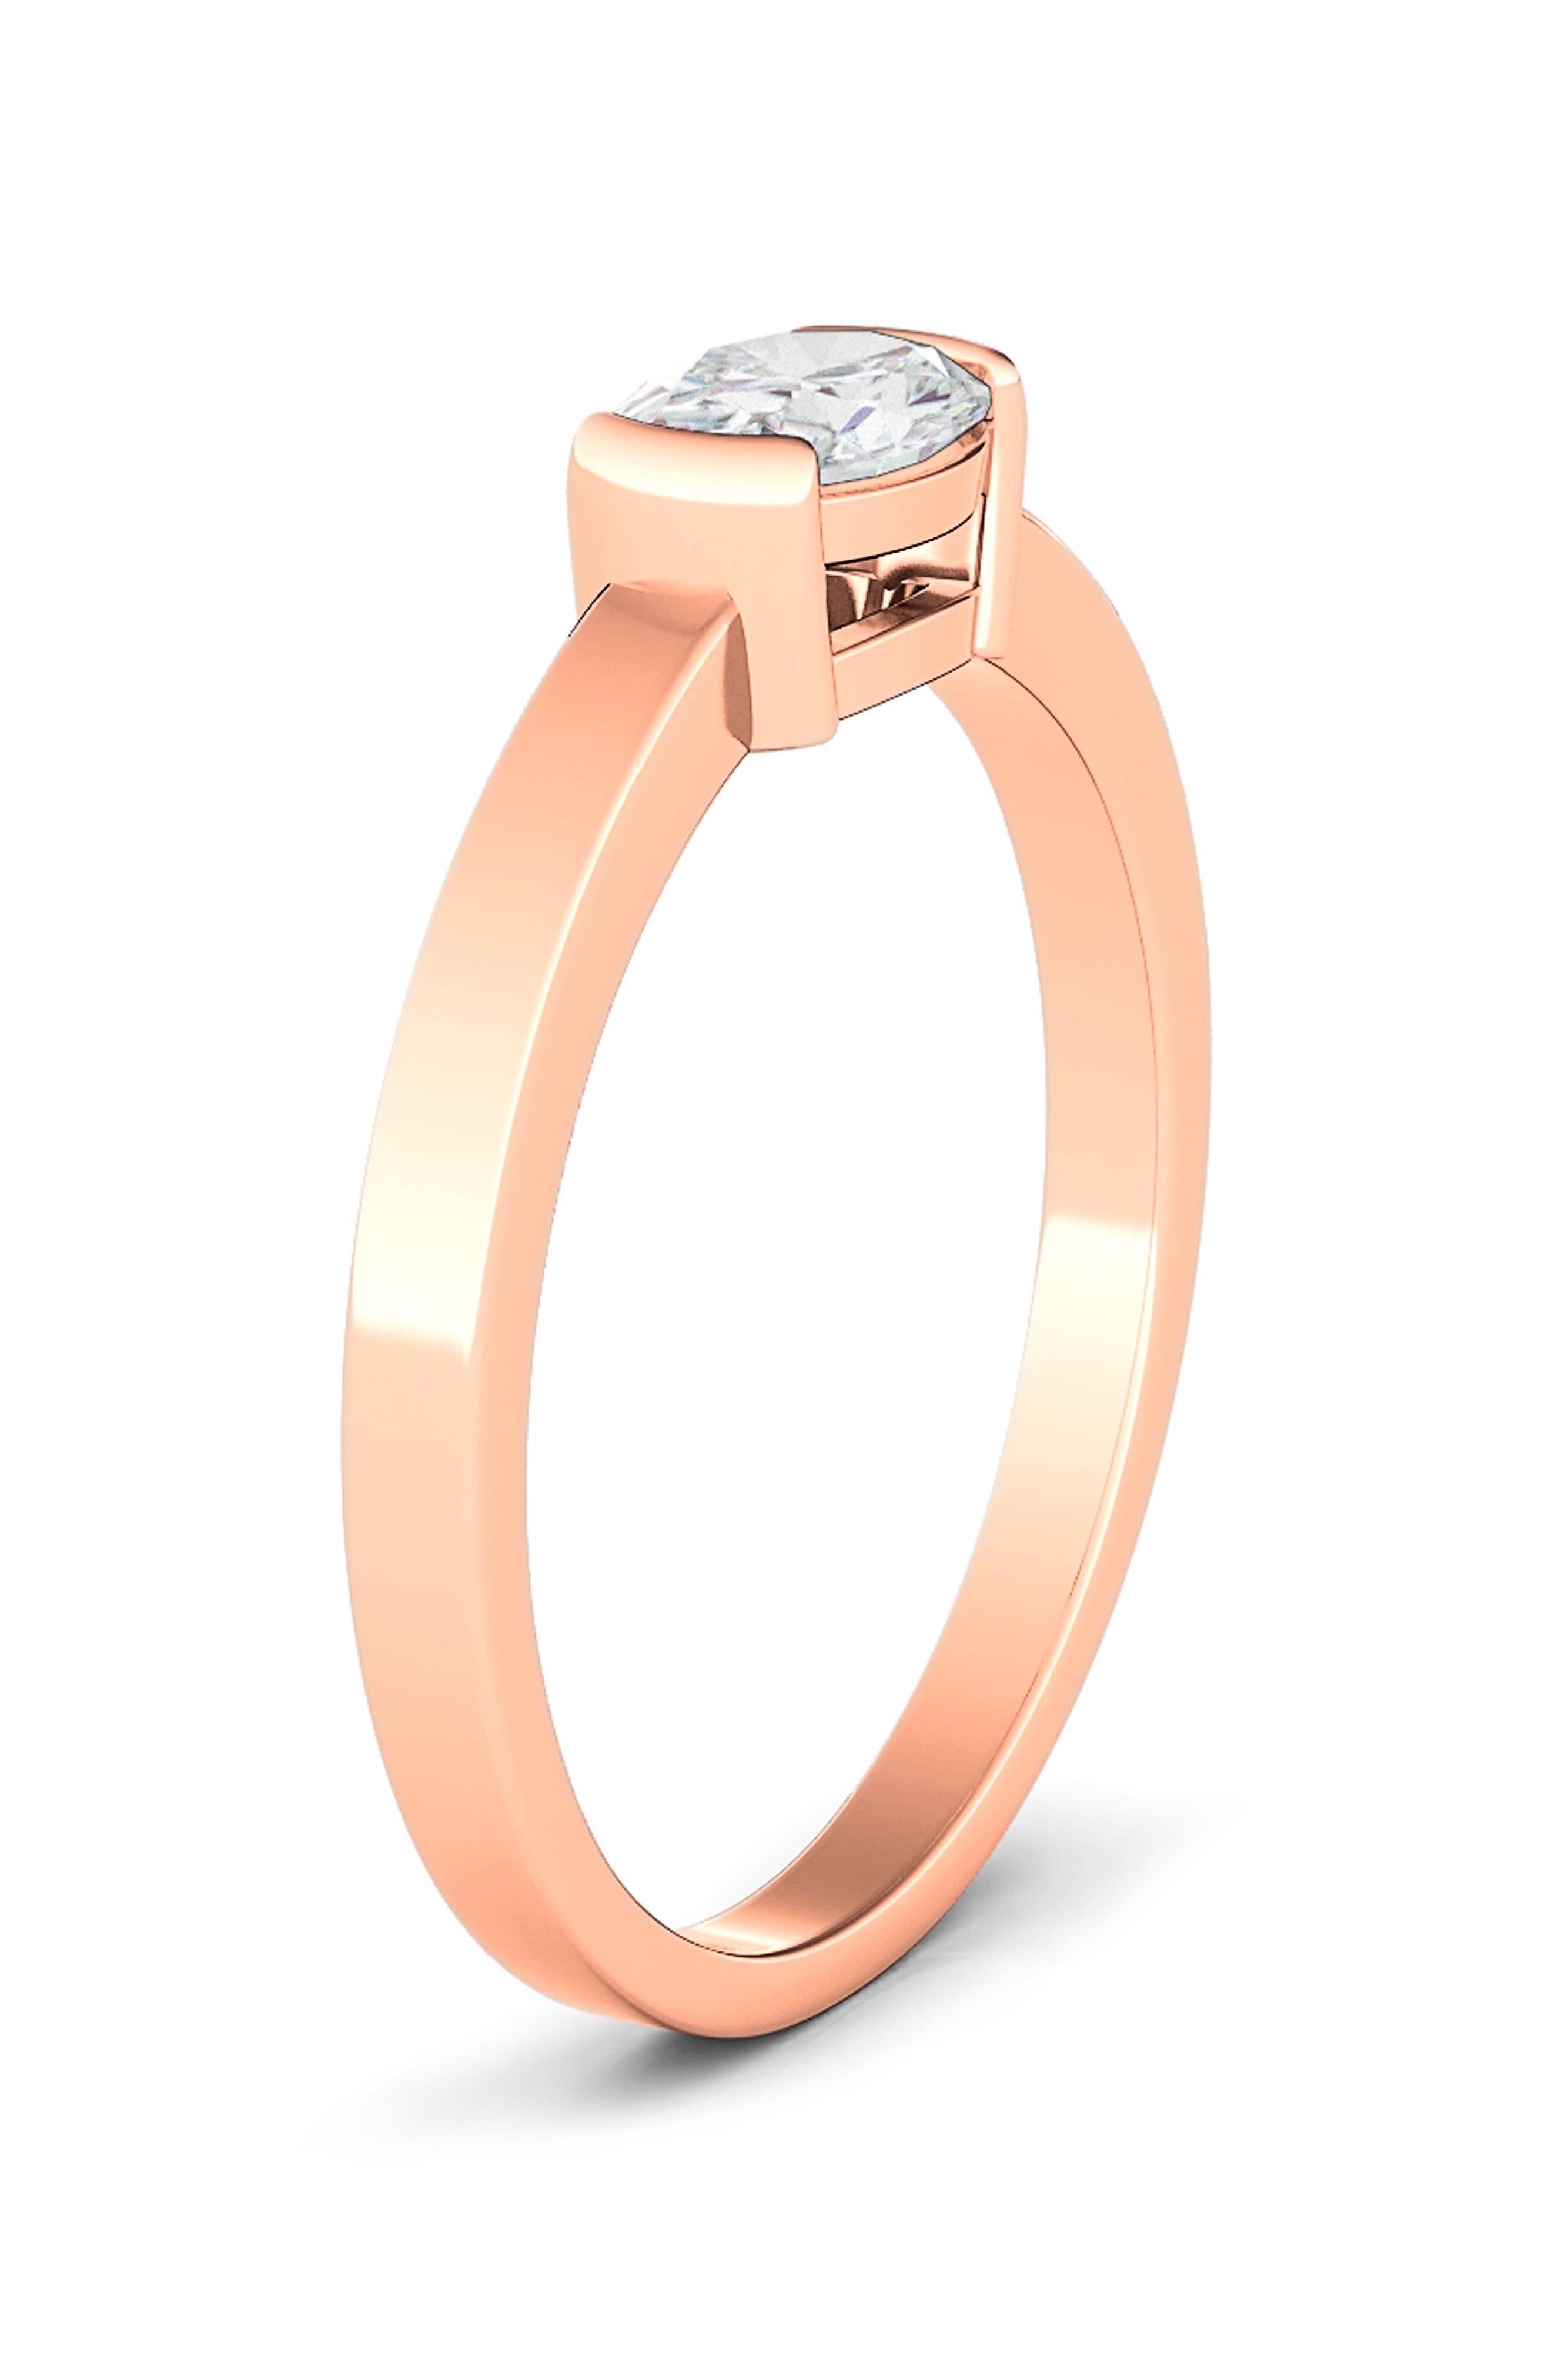 Oval Lab Grown Diamond Band Ring